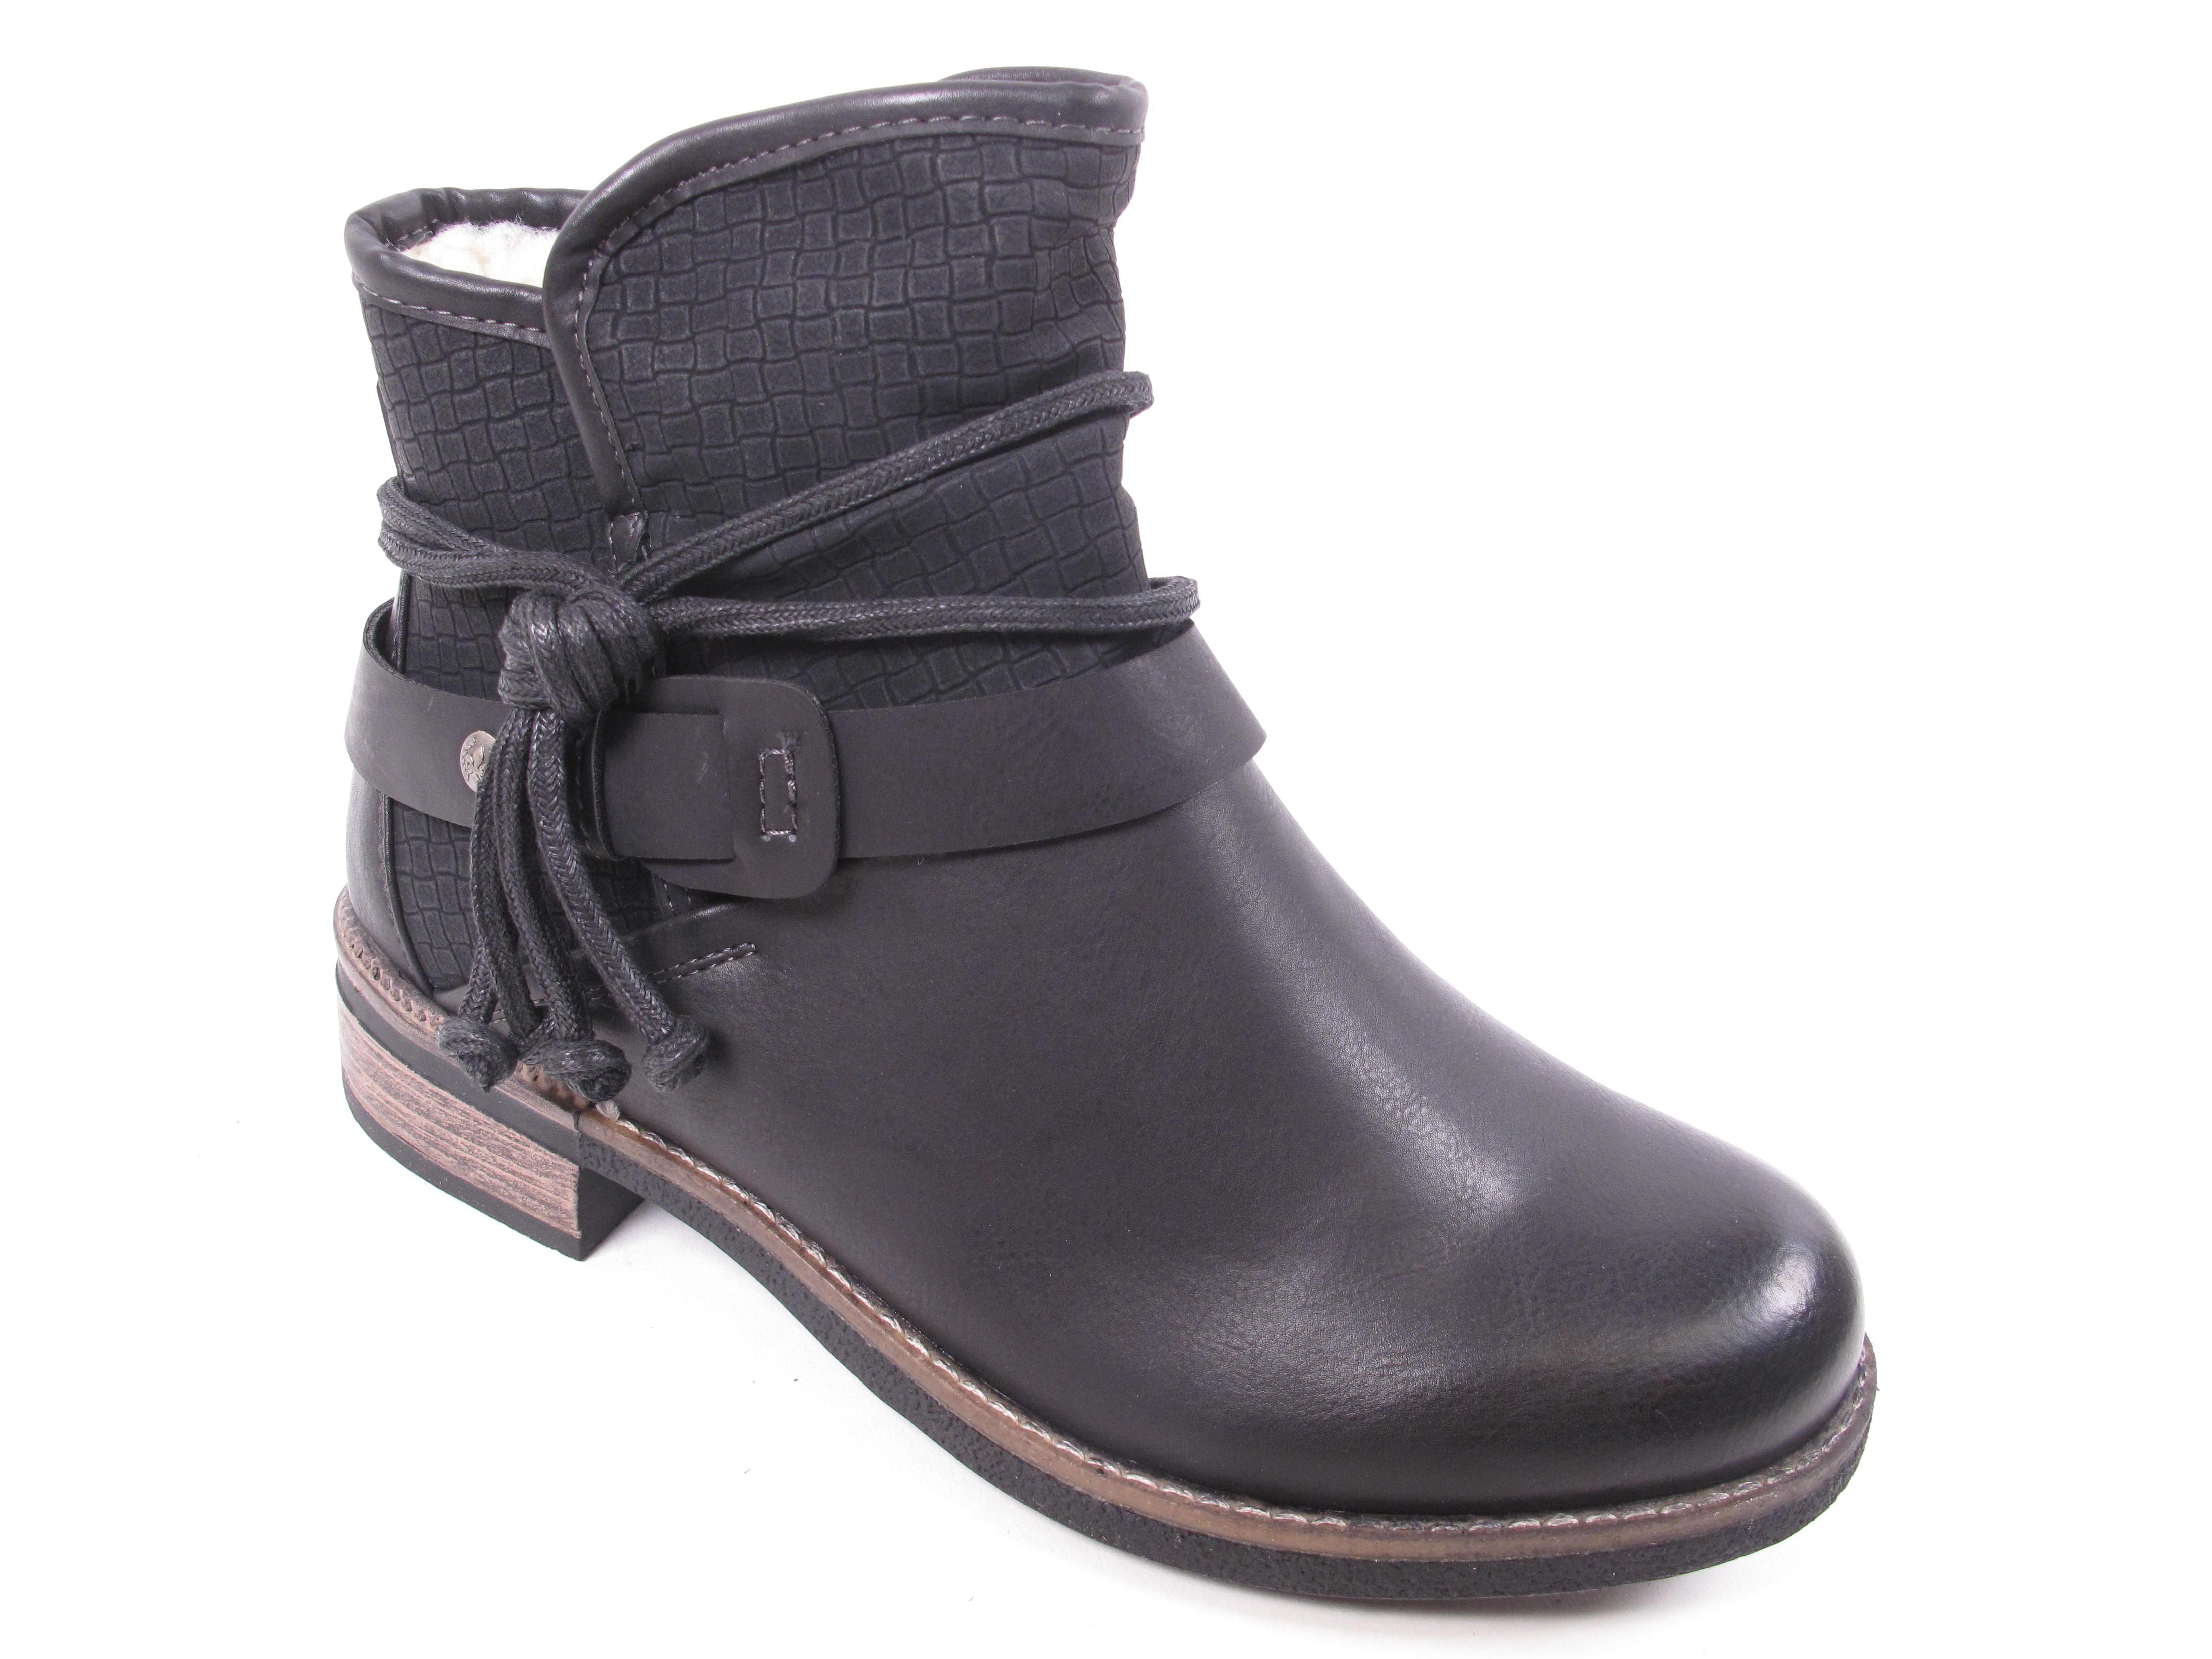 Rieker Damen Stiefel Stiefeletten Boots Winterschuhe 94689-00 Schwarz Neu